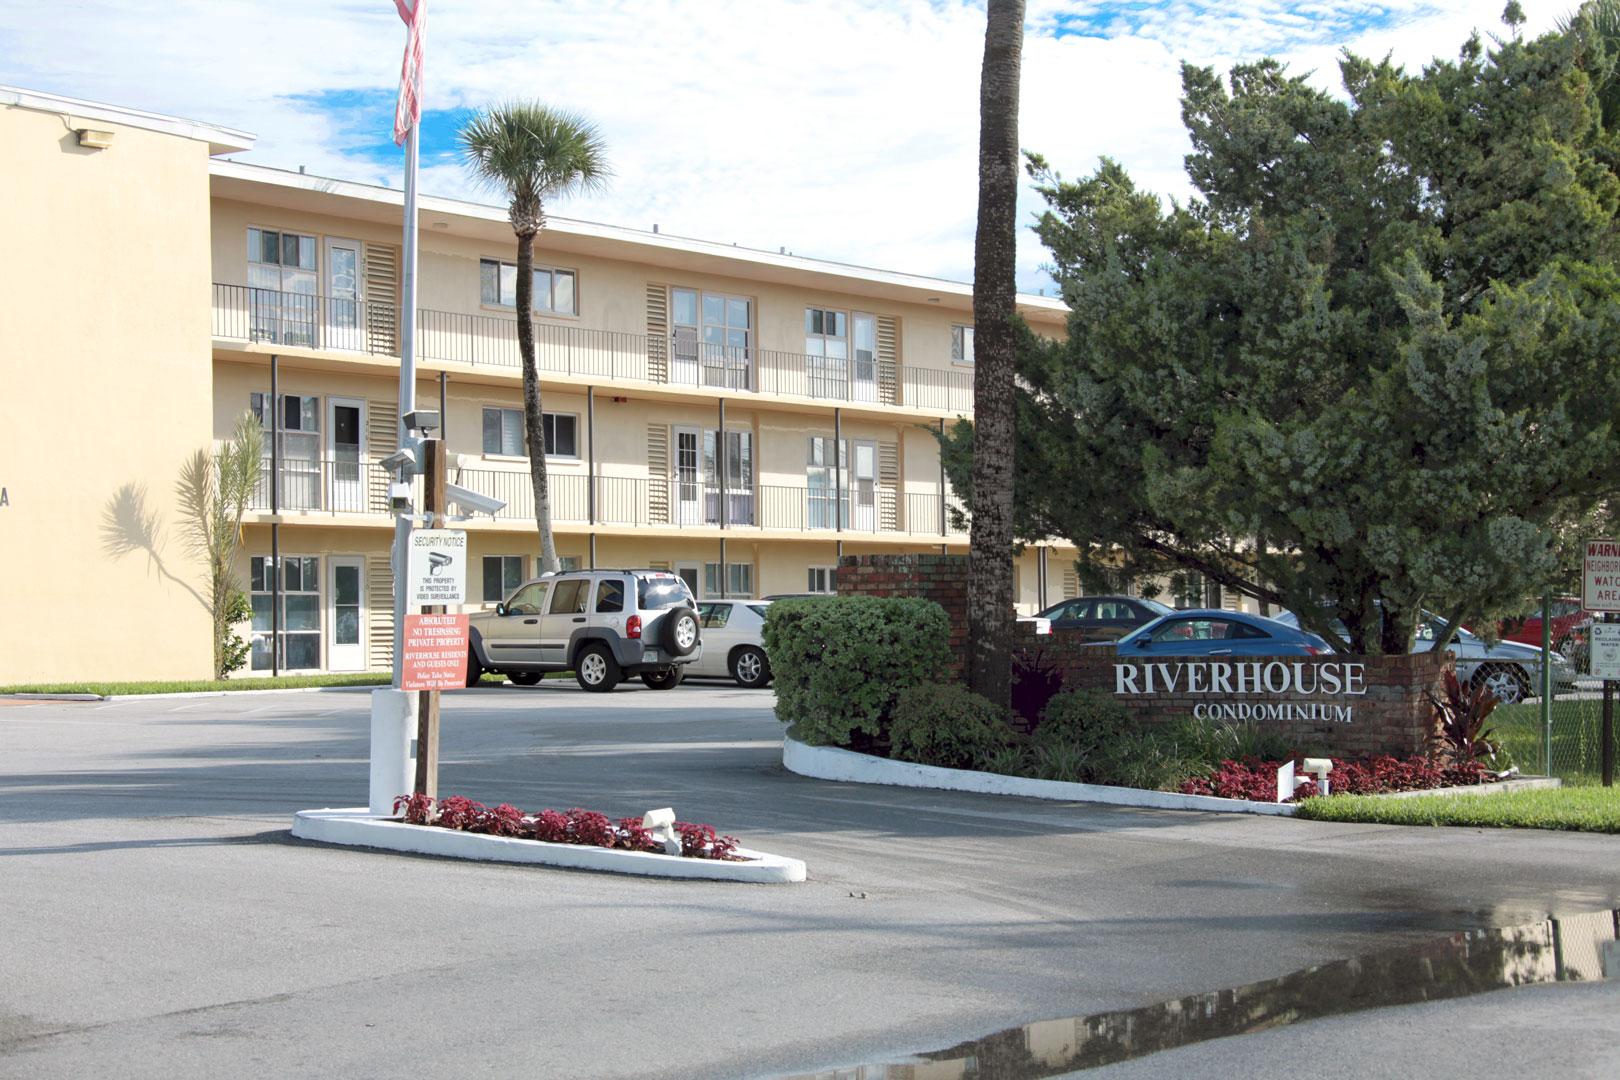 Daytona Condos River House Condominiums In Daytona Beach